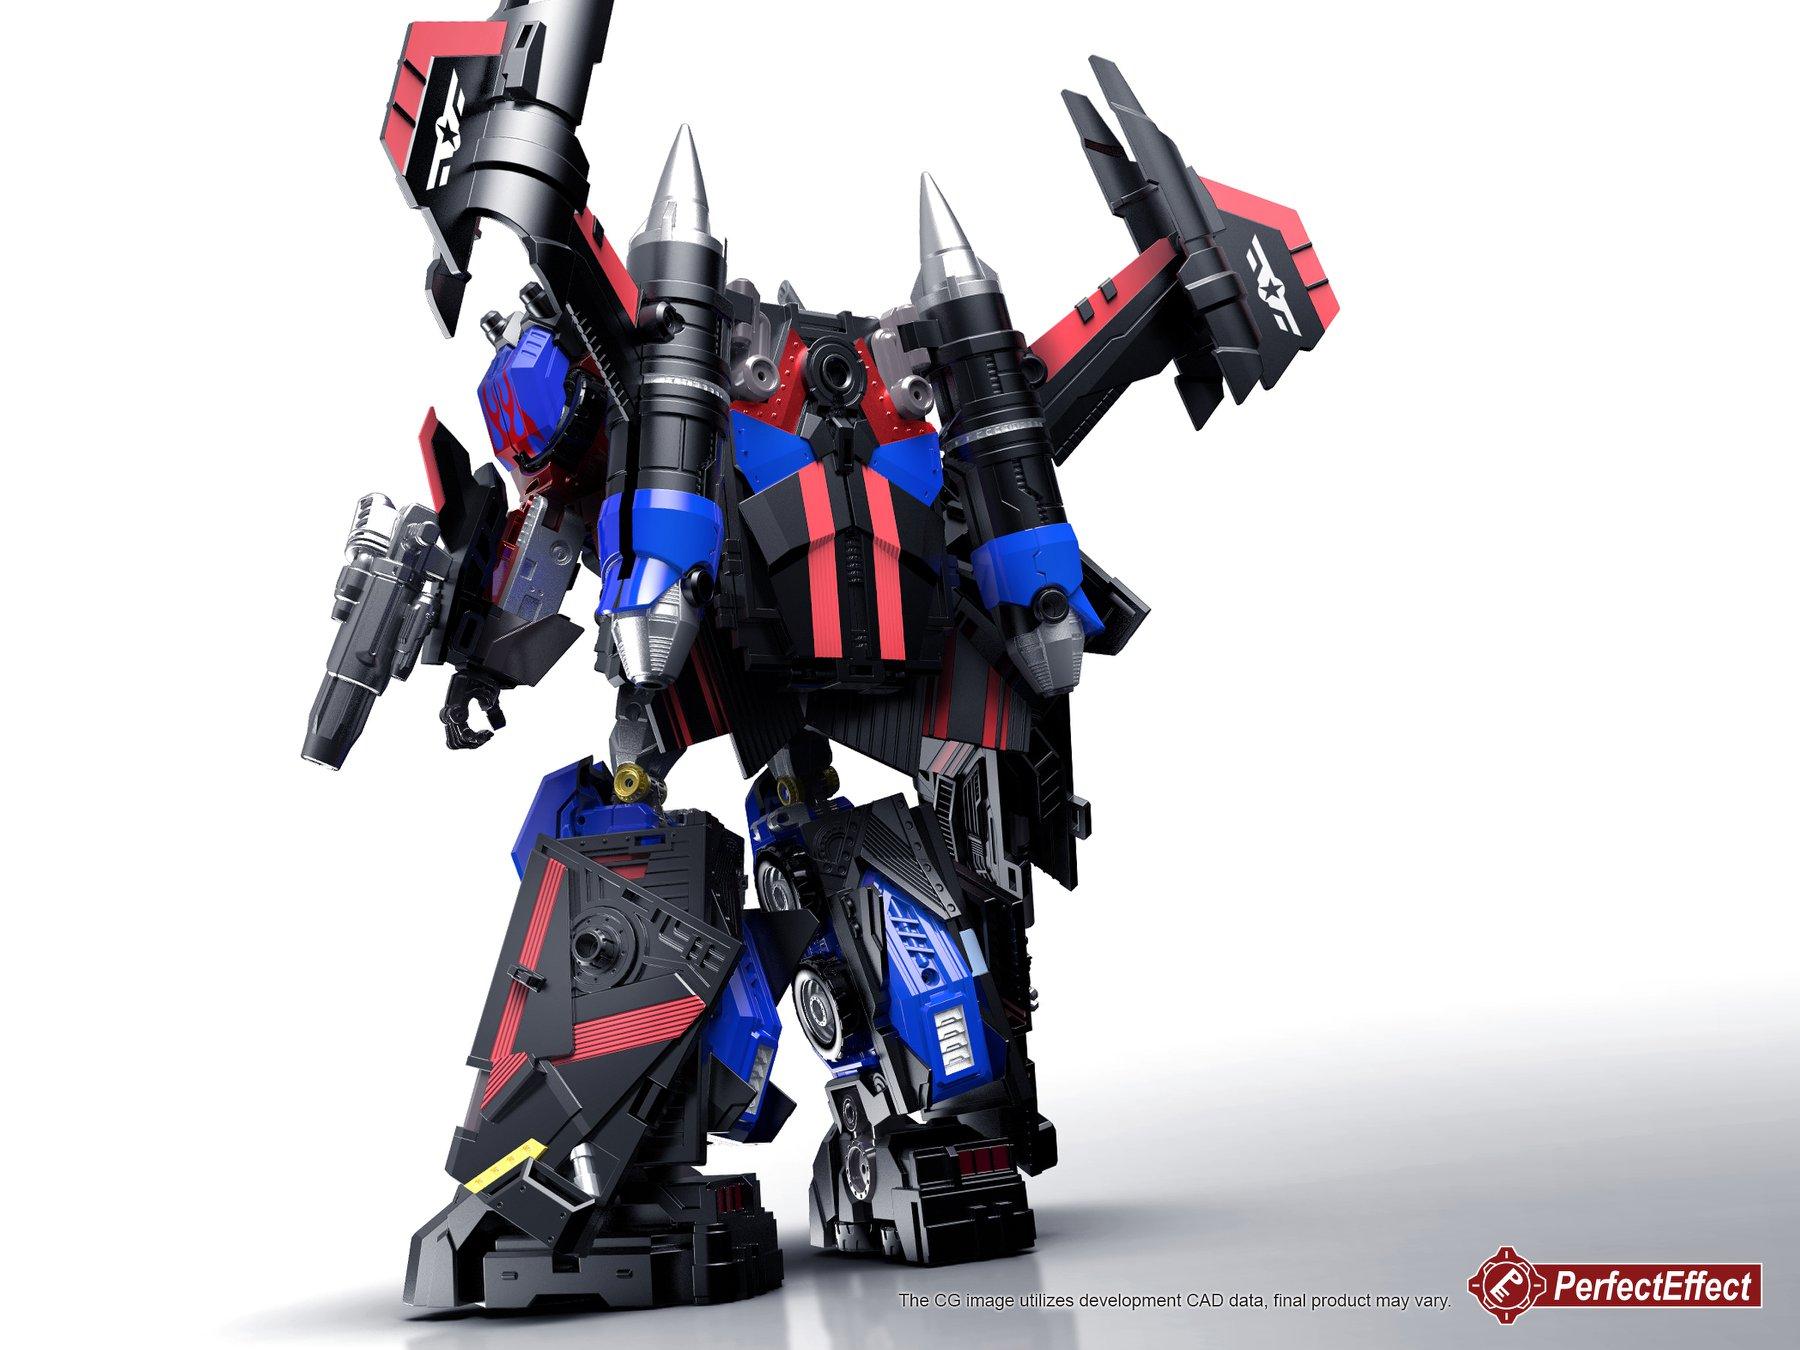 Optimus Transformers 1 Toy Truck Prime